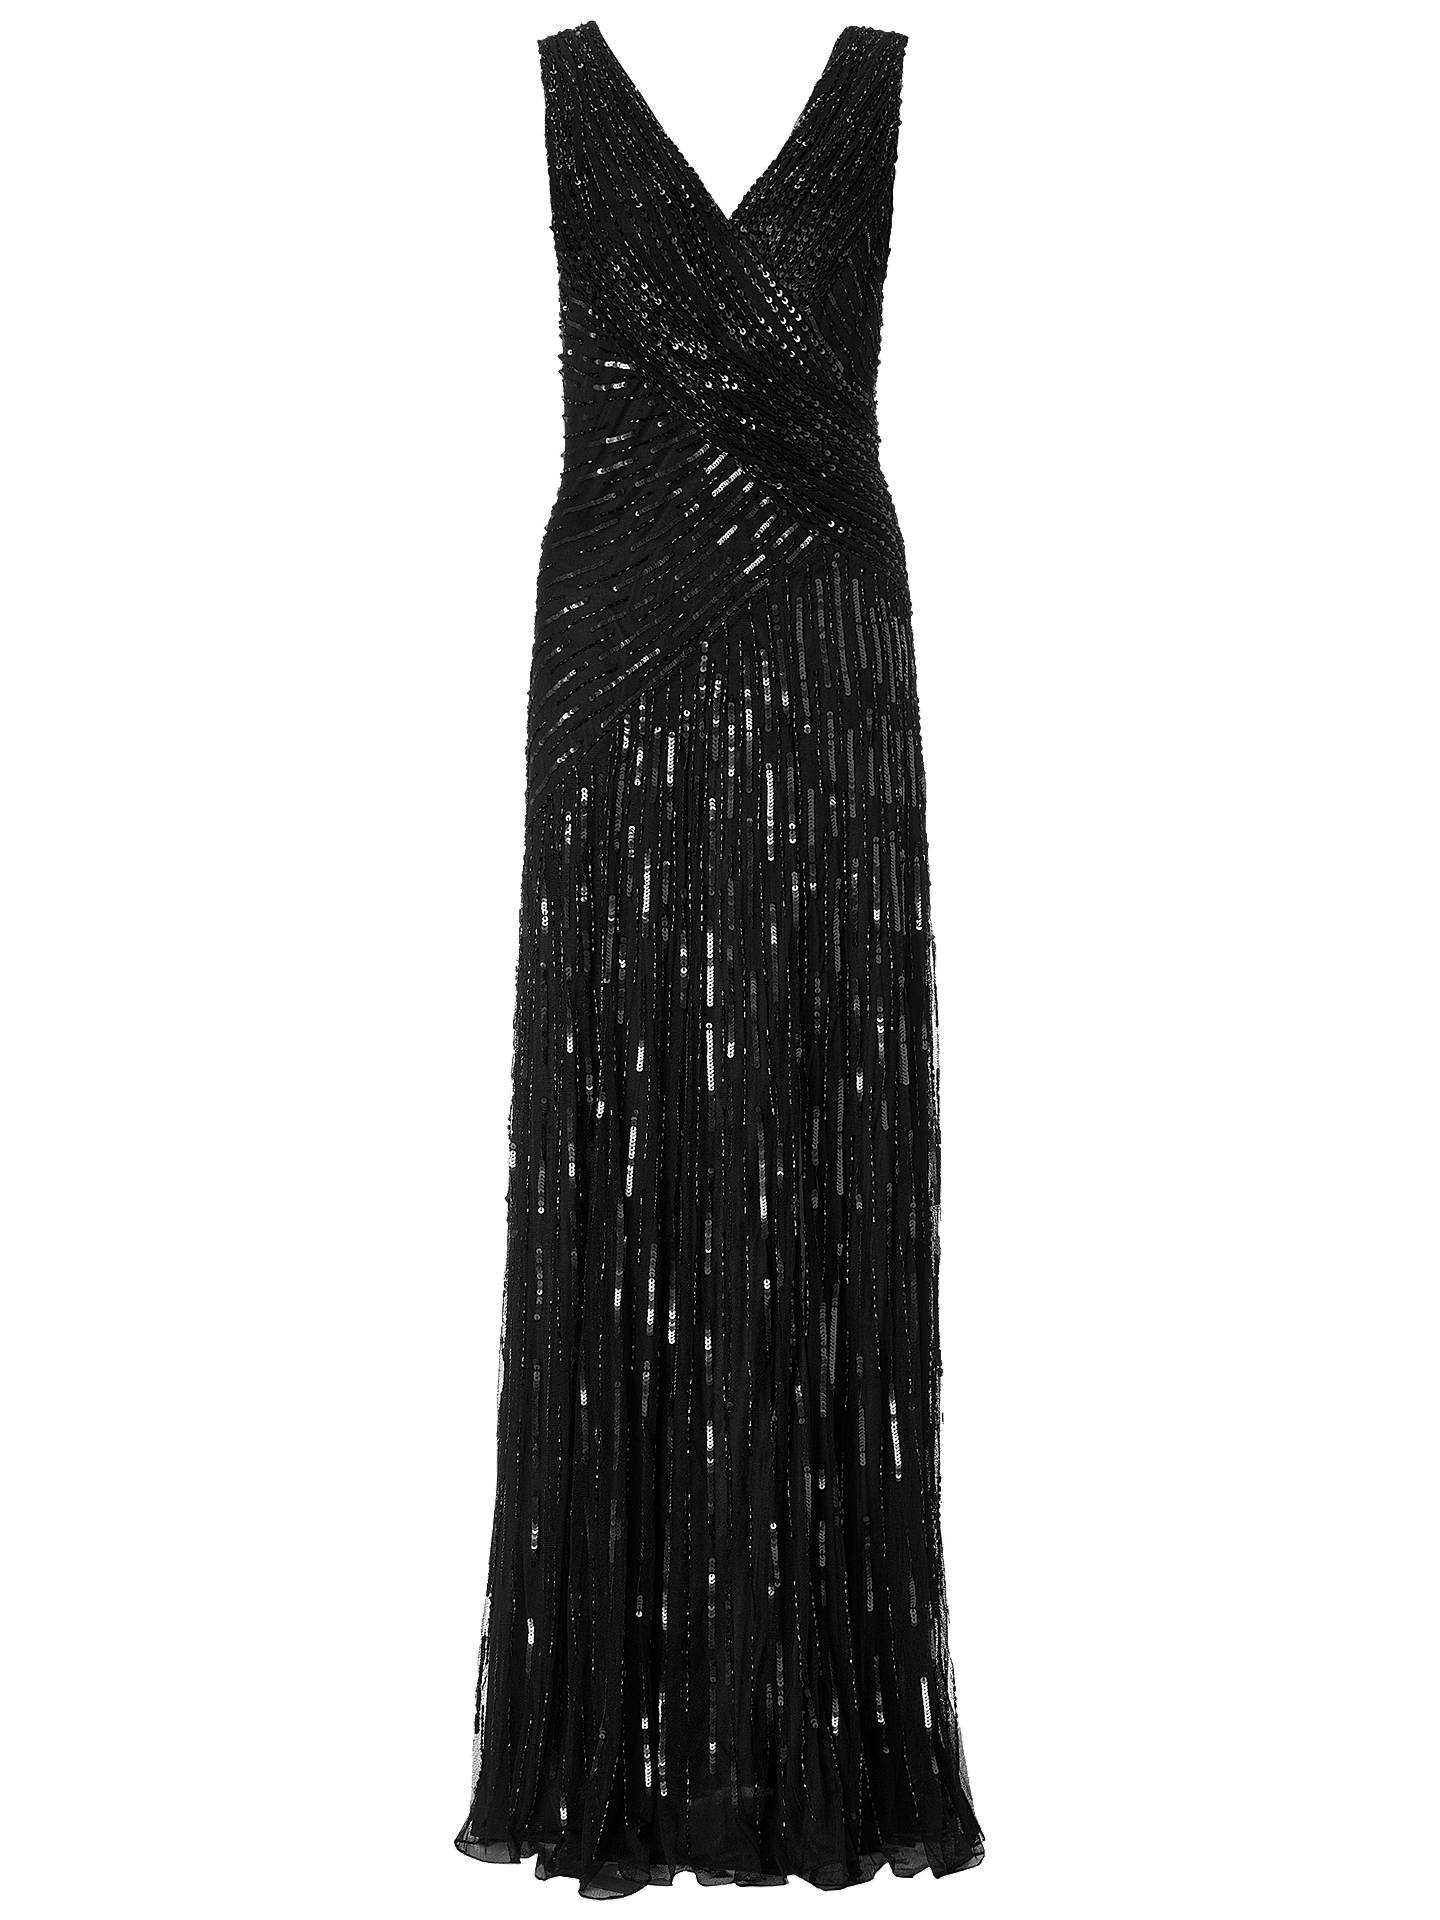 1afabf84 Buy Ariella Juliet Sequin Long Dress, Black, 8 Online at johnlewis.com ...